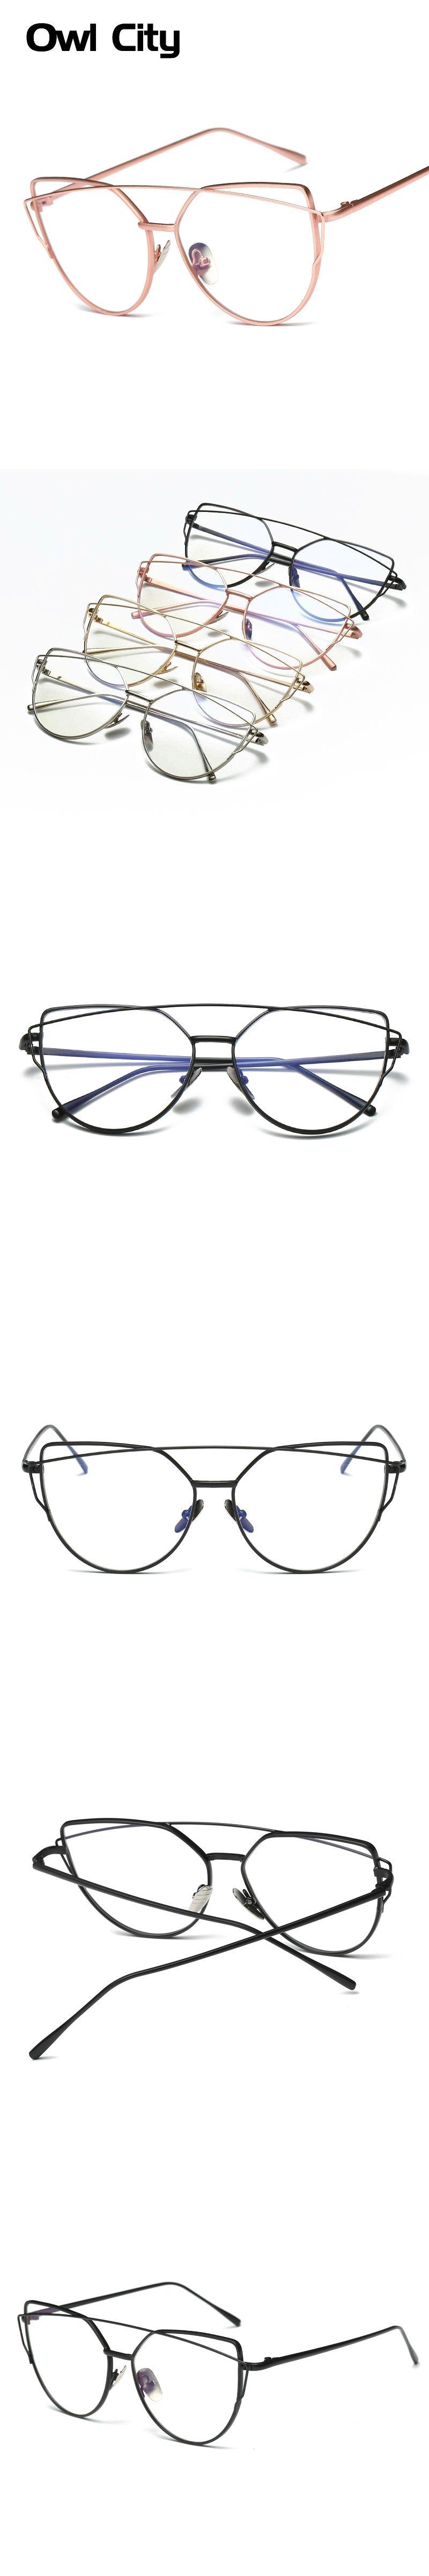 7db1ab32c24 Newest Women Eyeglasses Brand Designer Cat eye Rose Alloy Frame Anti-blue  ray Optical Clear